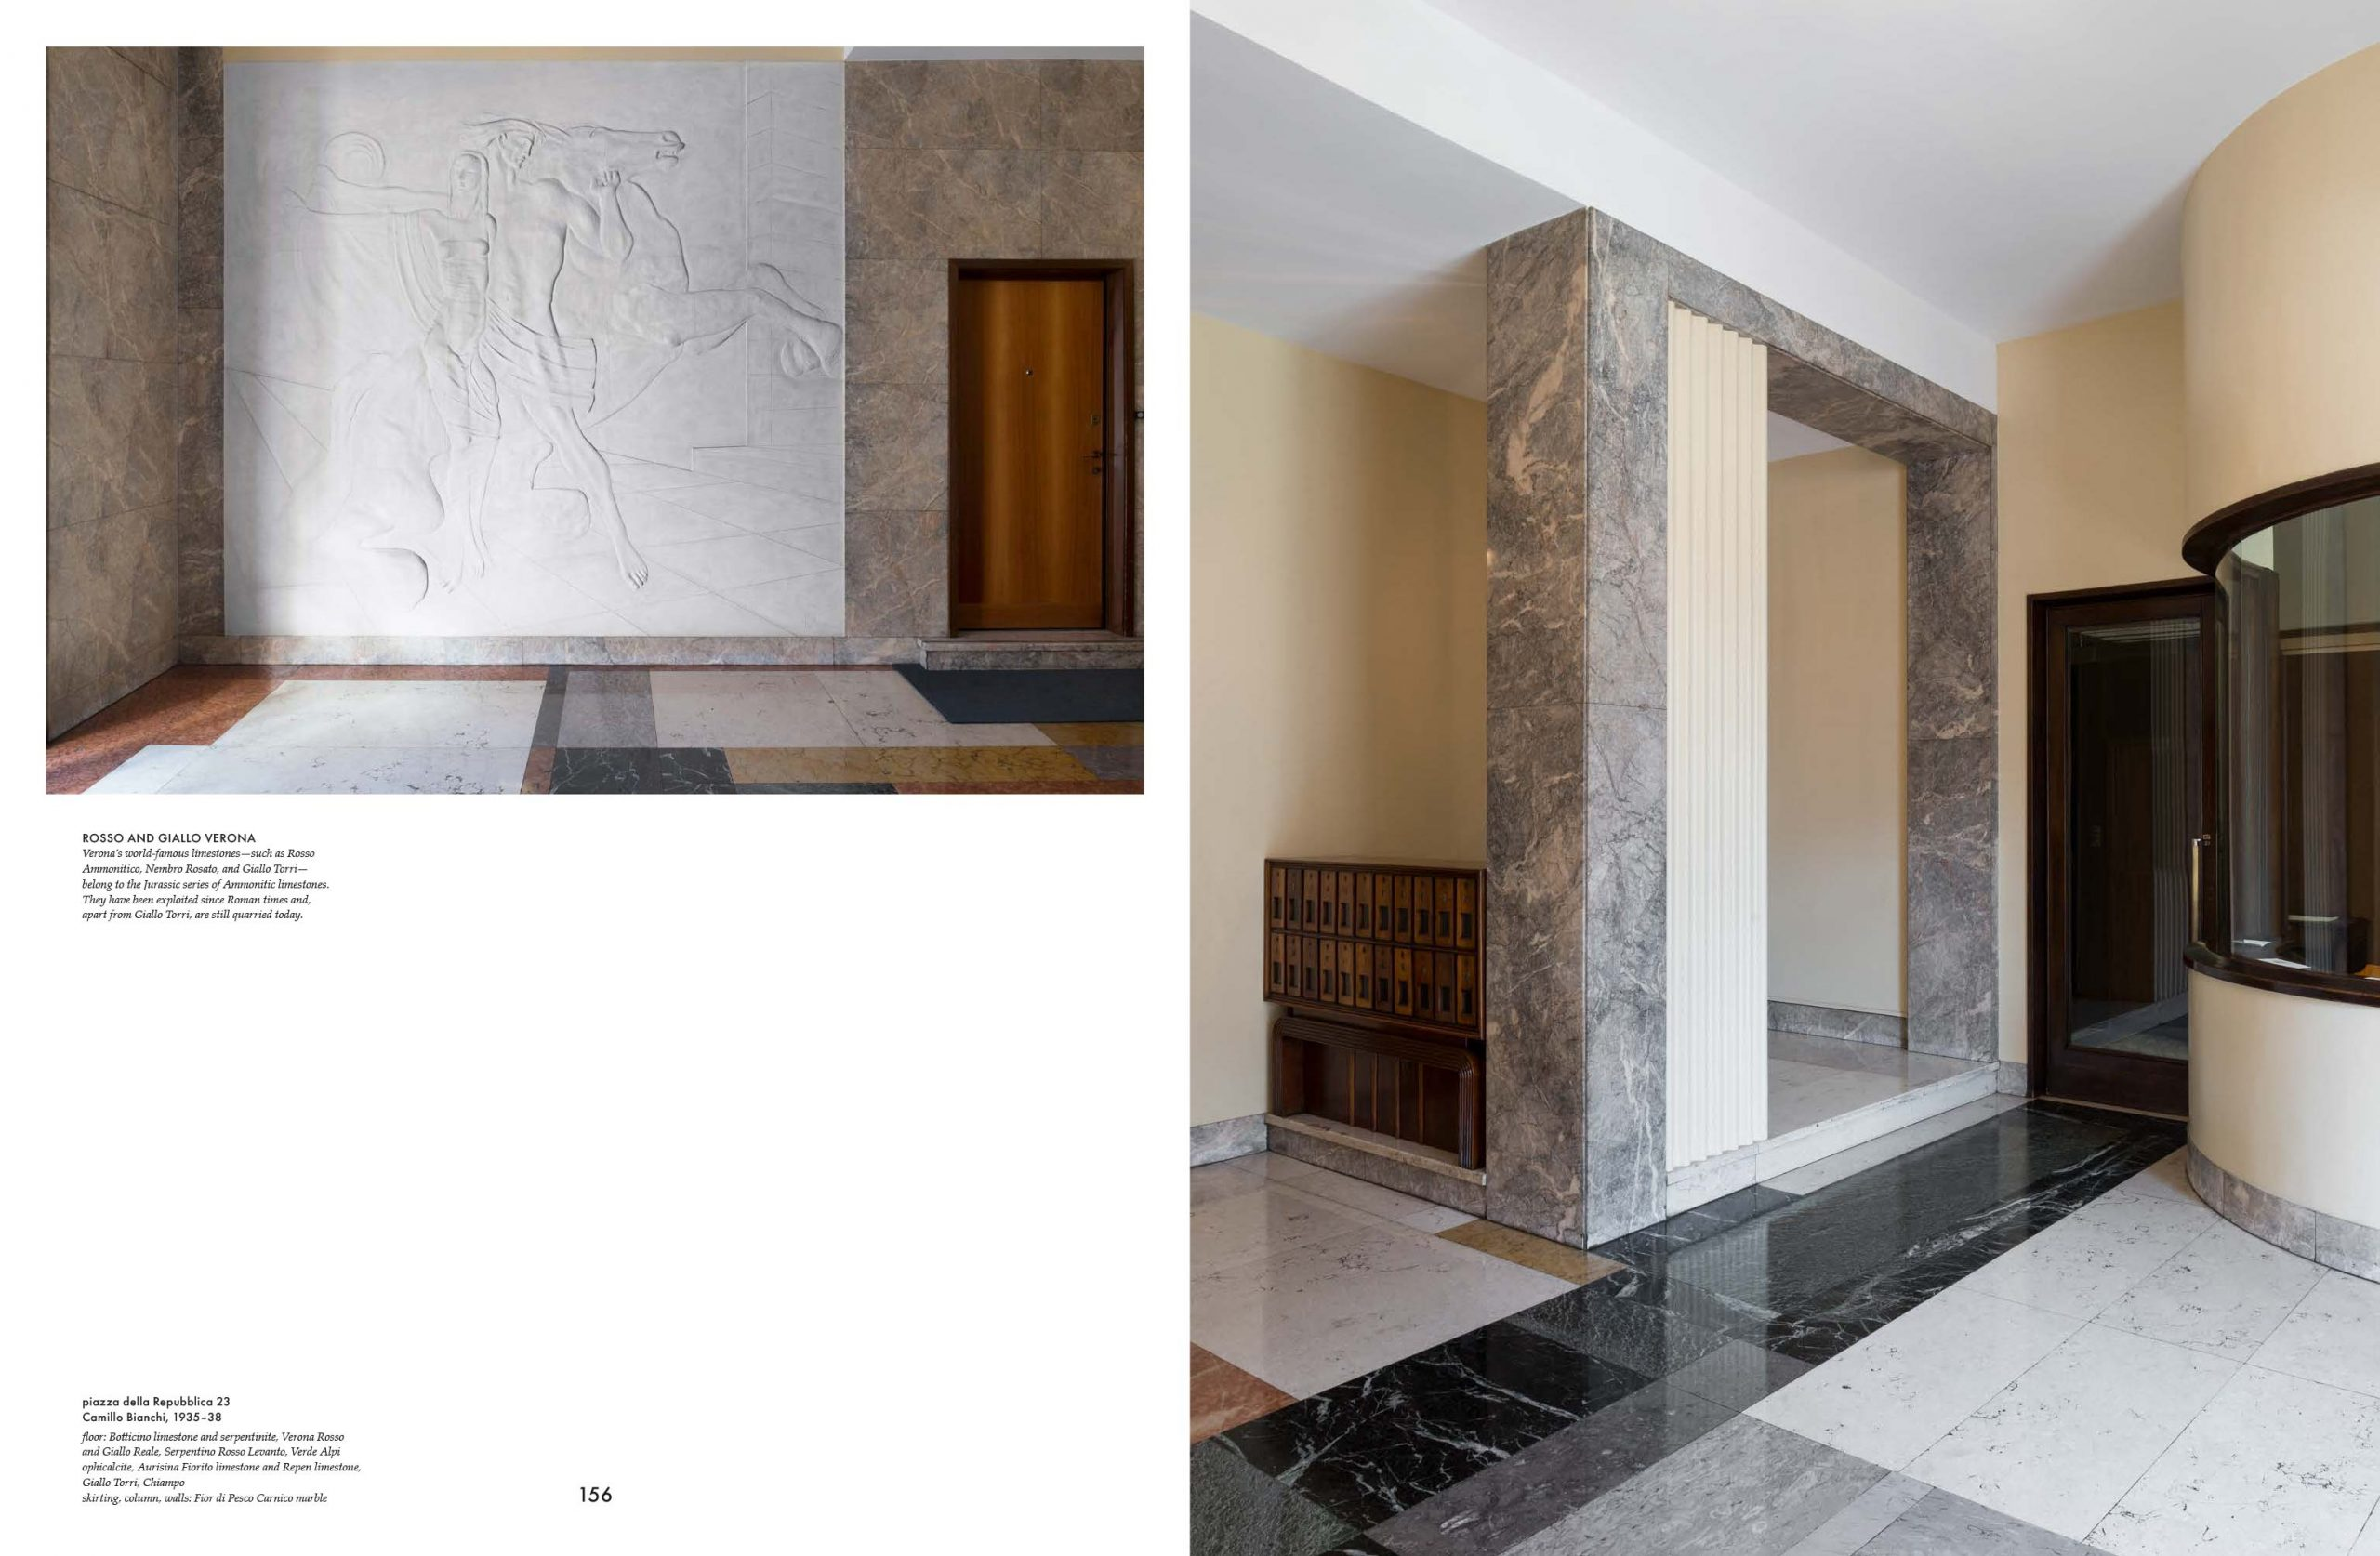 nicoletta-dalfino-karl-kolbitz-entryways-of-milan-taschen-pp156-157-scaled